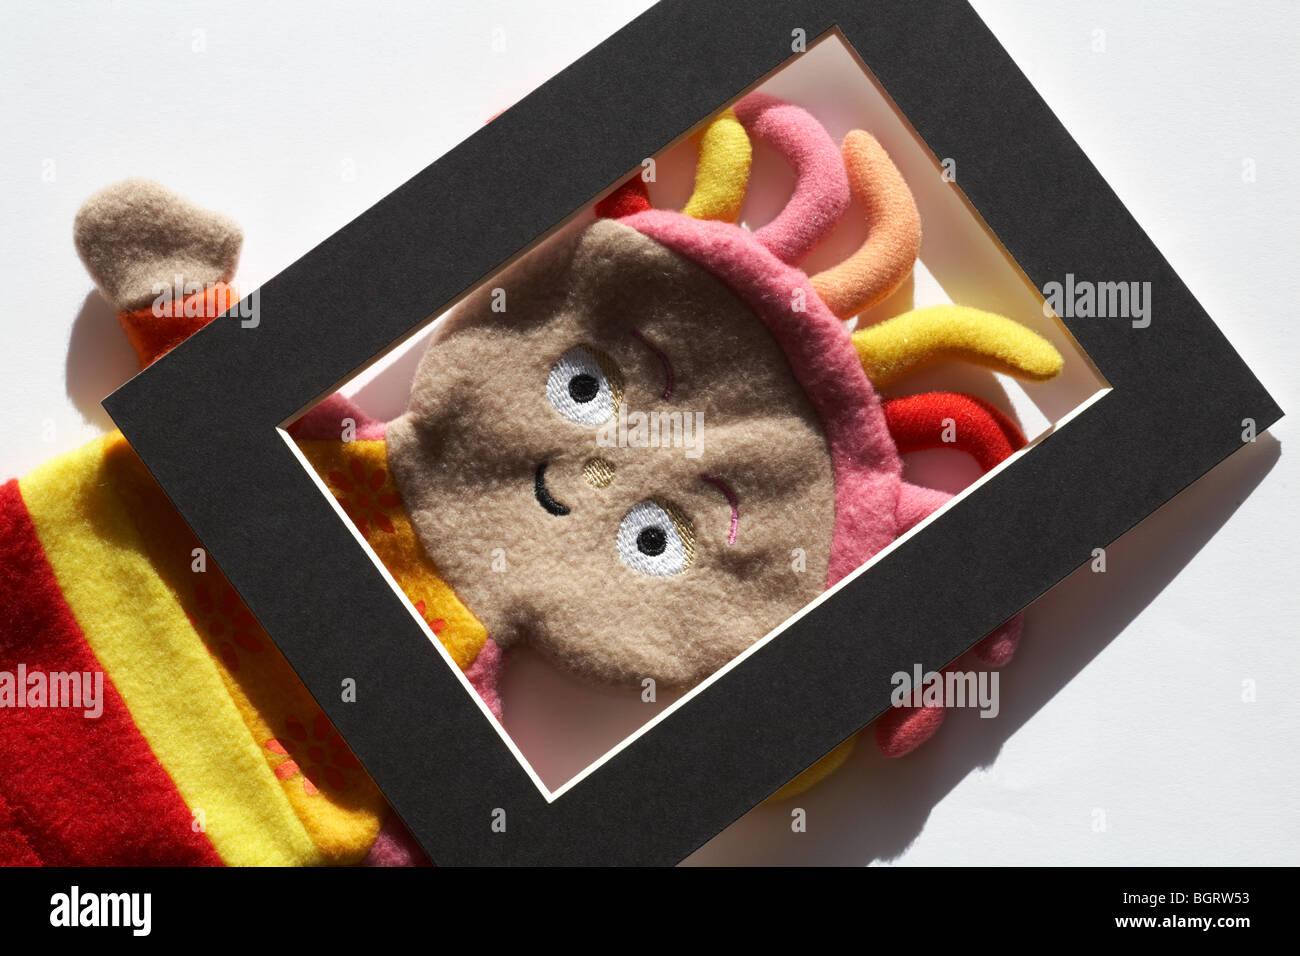 Upsey Daisy - You\'ve been framed Stock Photo: 27569503 - Alamy